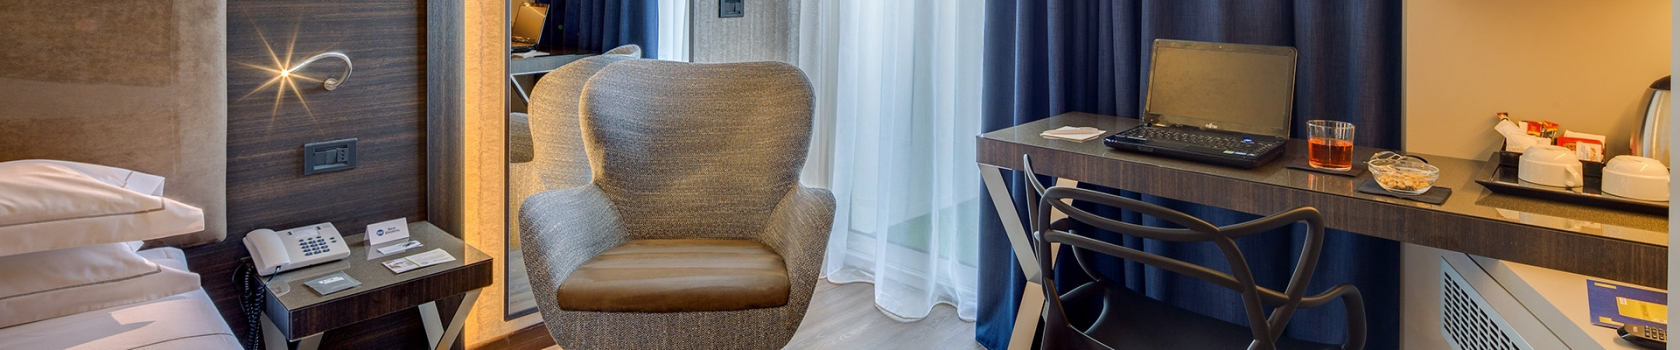 Tanti comfort nelle nostre camere a Parma